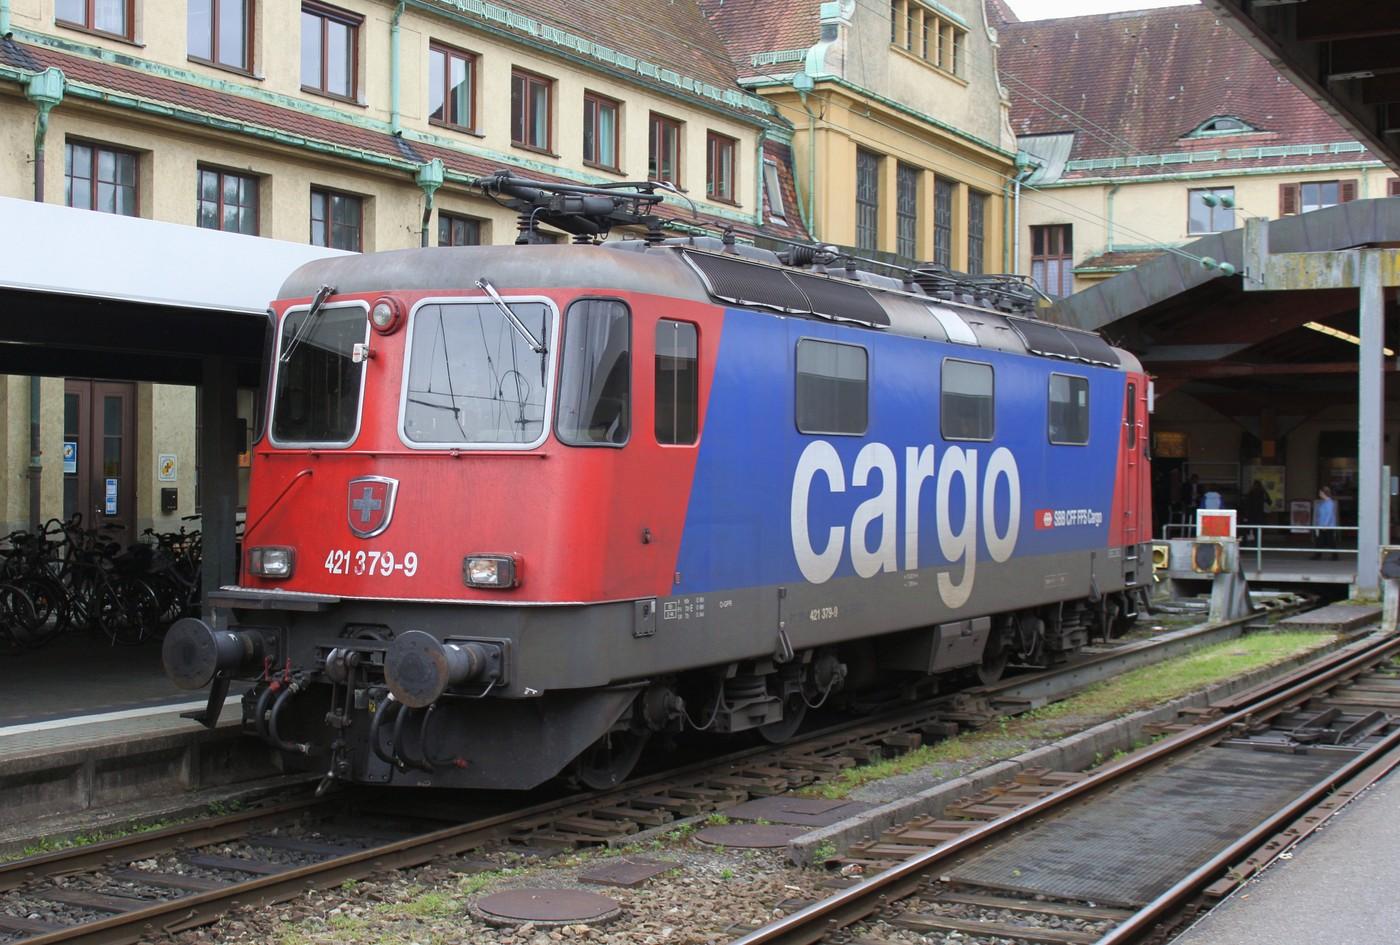 http://www.eisenbahn-im-bild.de/Temp/B_14_Lind_IMG_1704.jpg